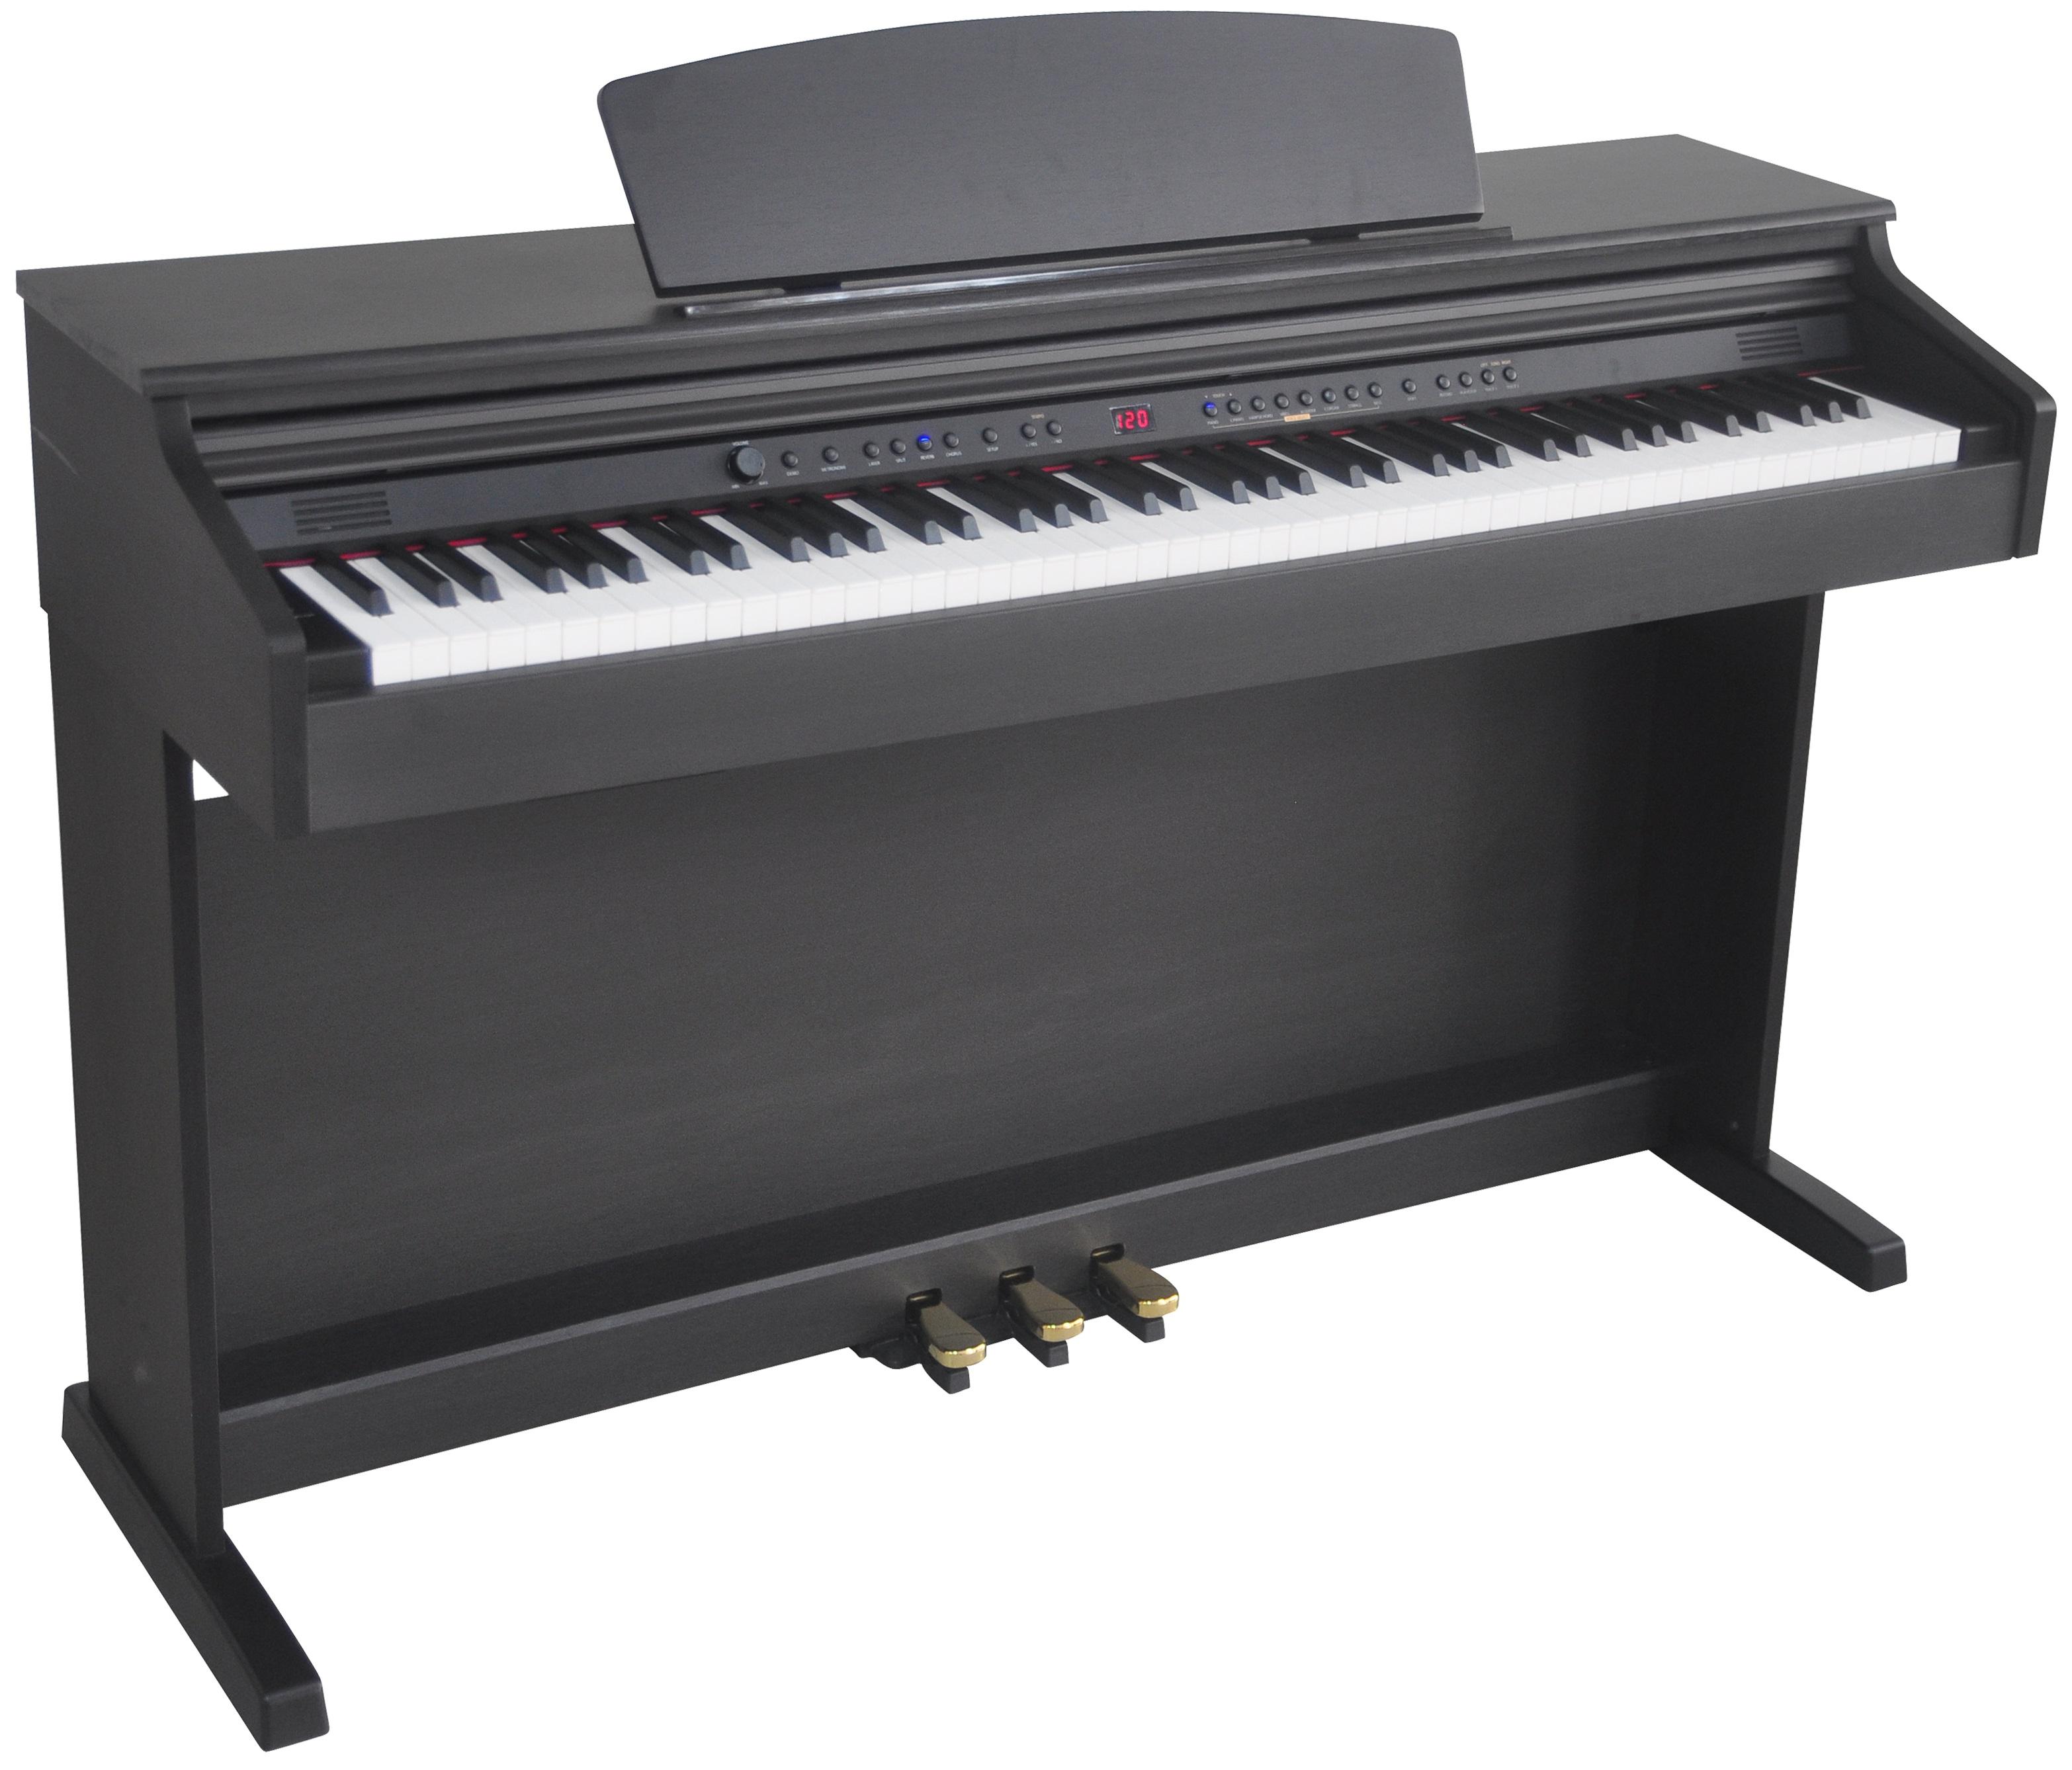 PIANO DIGITAL ARTESIA DP3